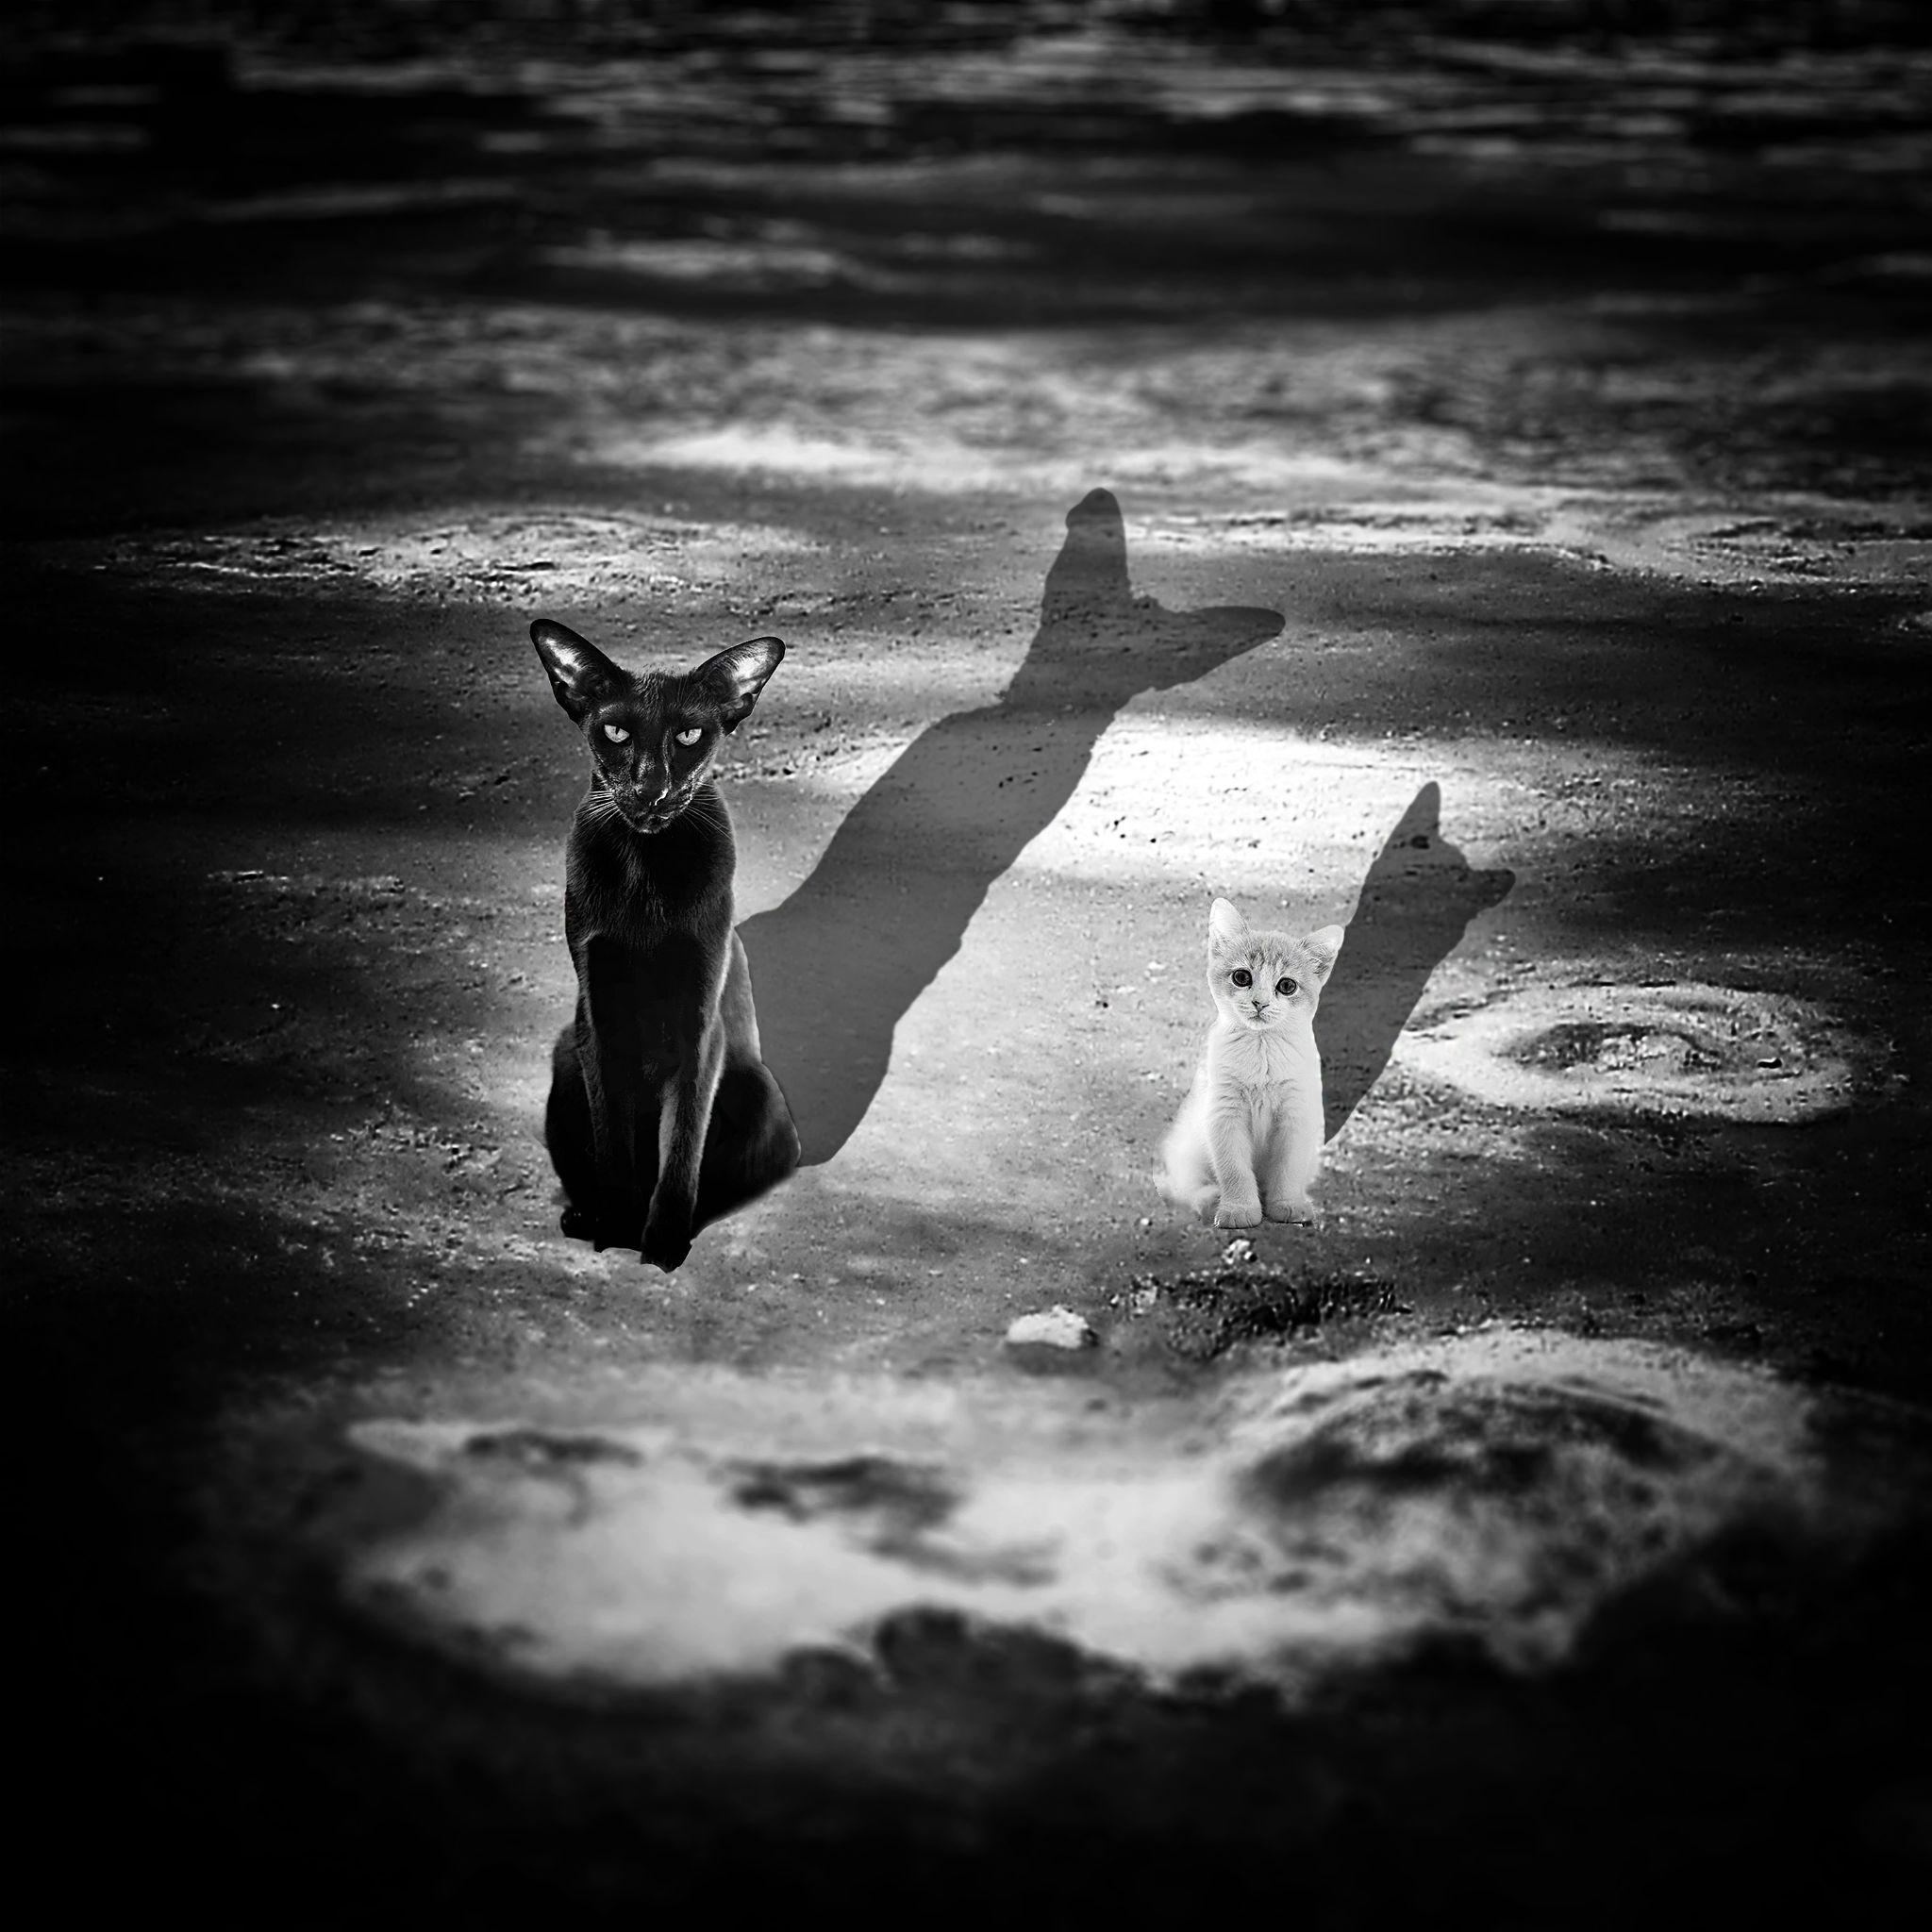 Crna mačka, beli mačor by R. Kruglinski